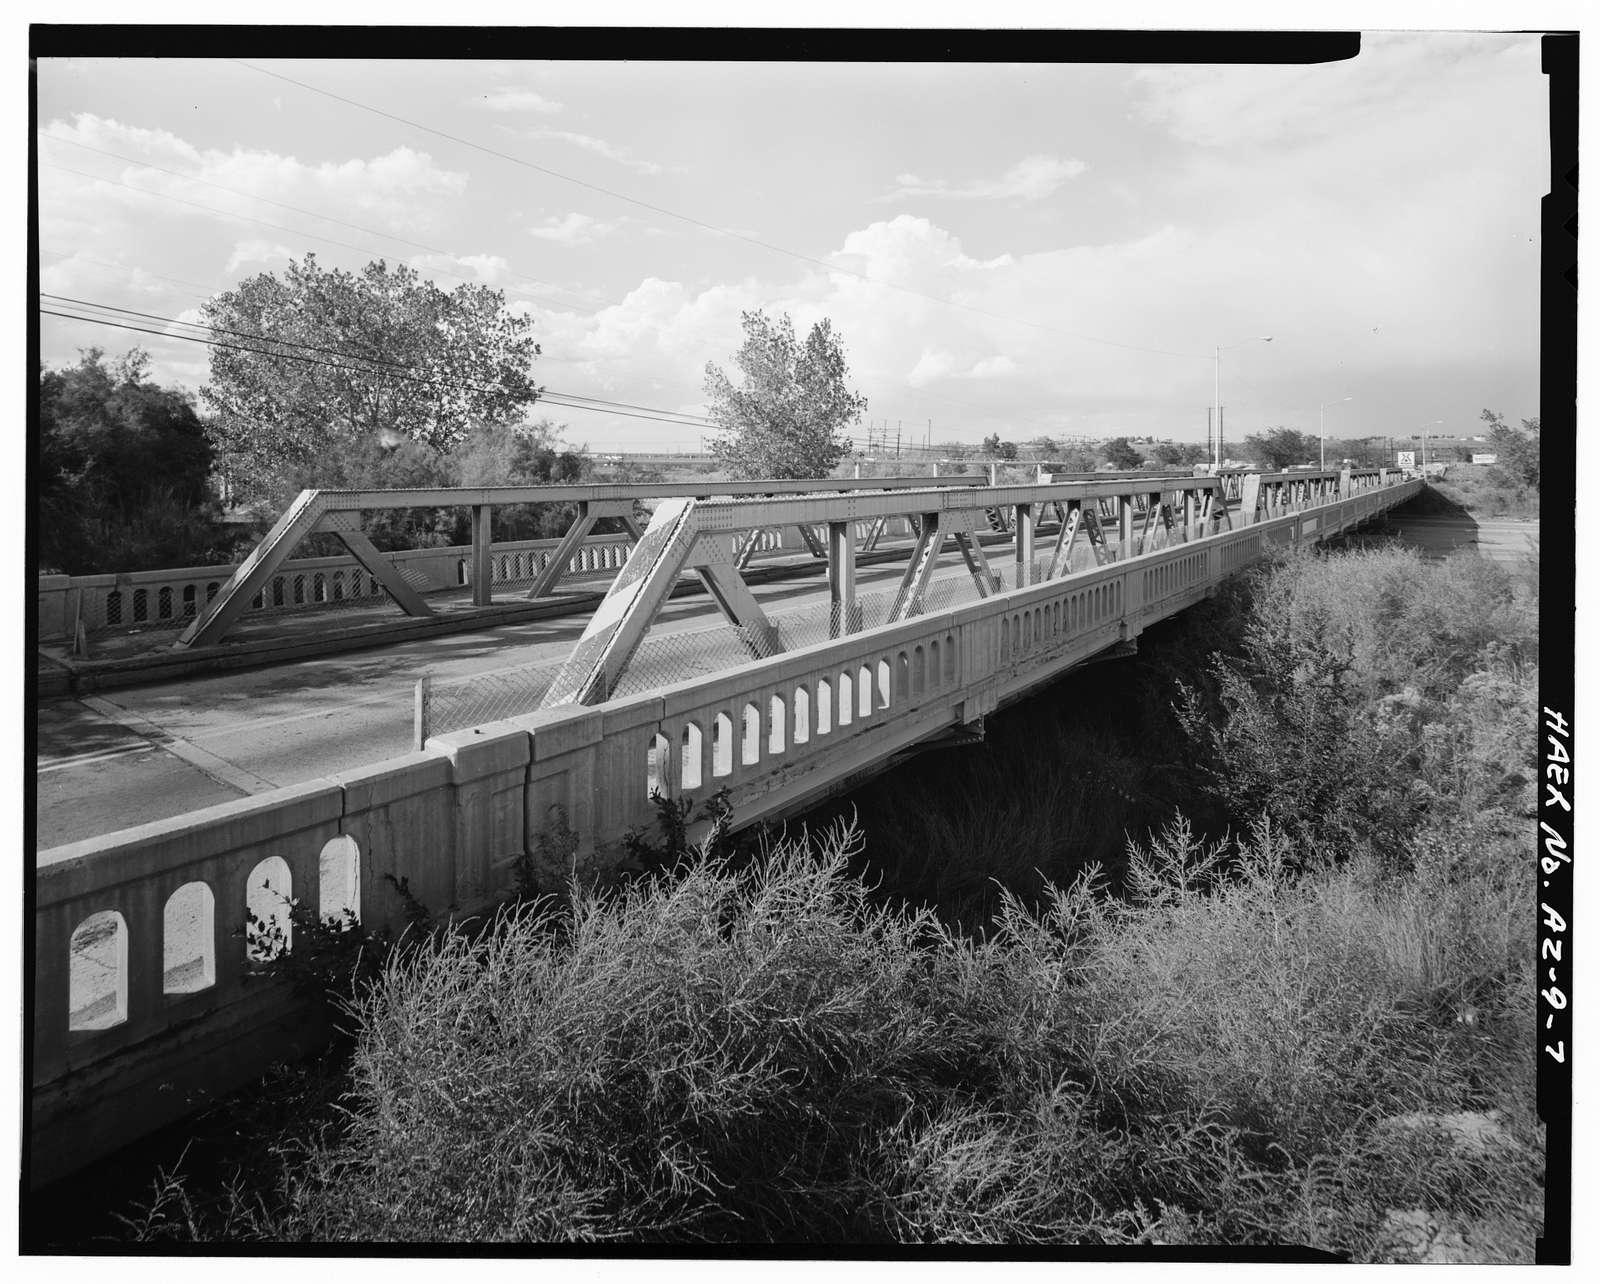 Holbrook Bridge, Spanning Little Colorado River at AZ 77, Holbrook, Navajo County, AZ